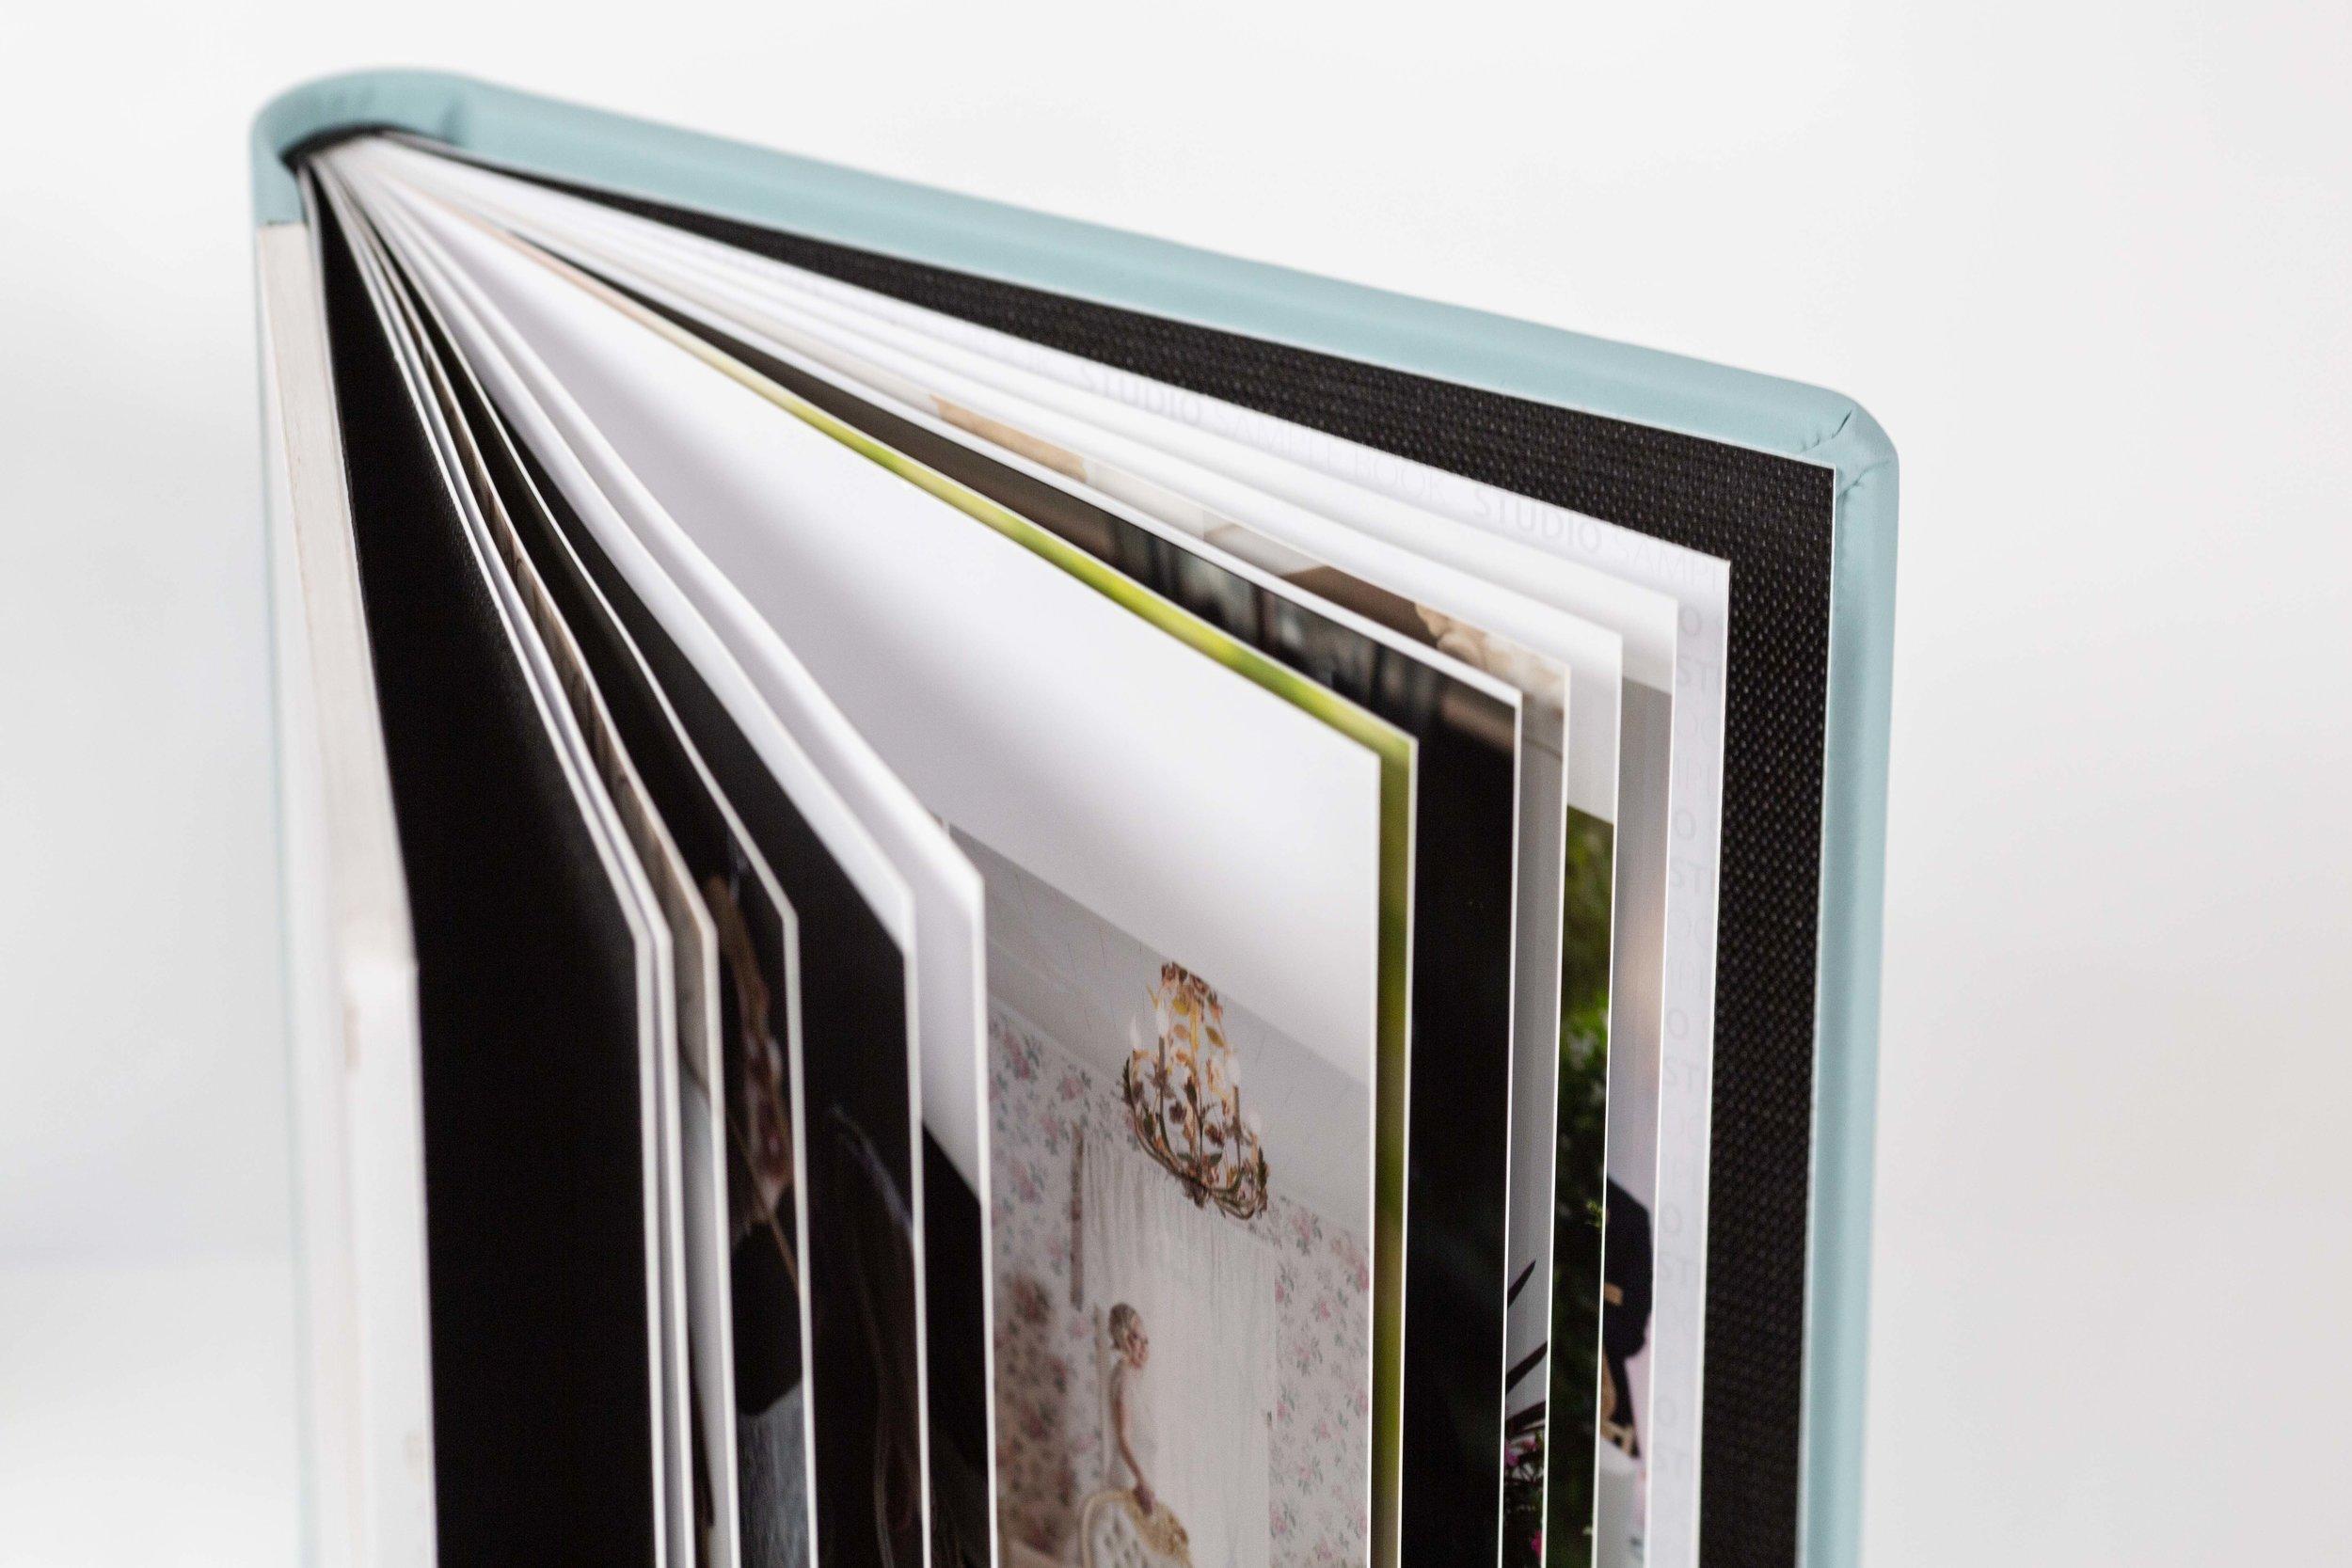 DanaFramesPhoto+Design_ Product Albums Frames-23.jpg